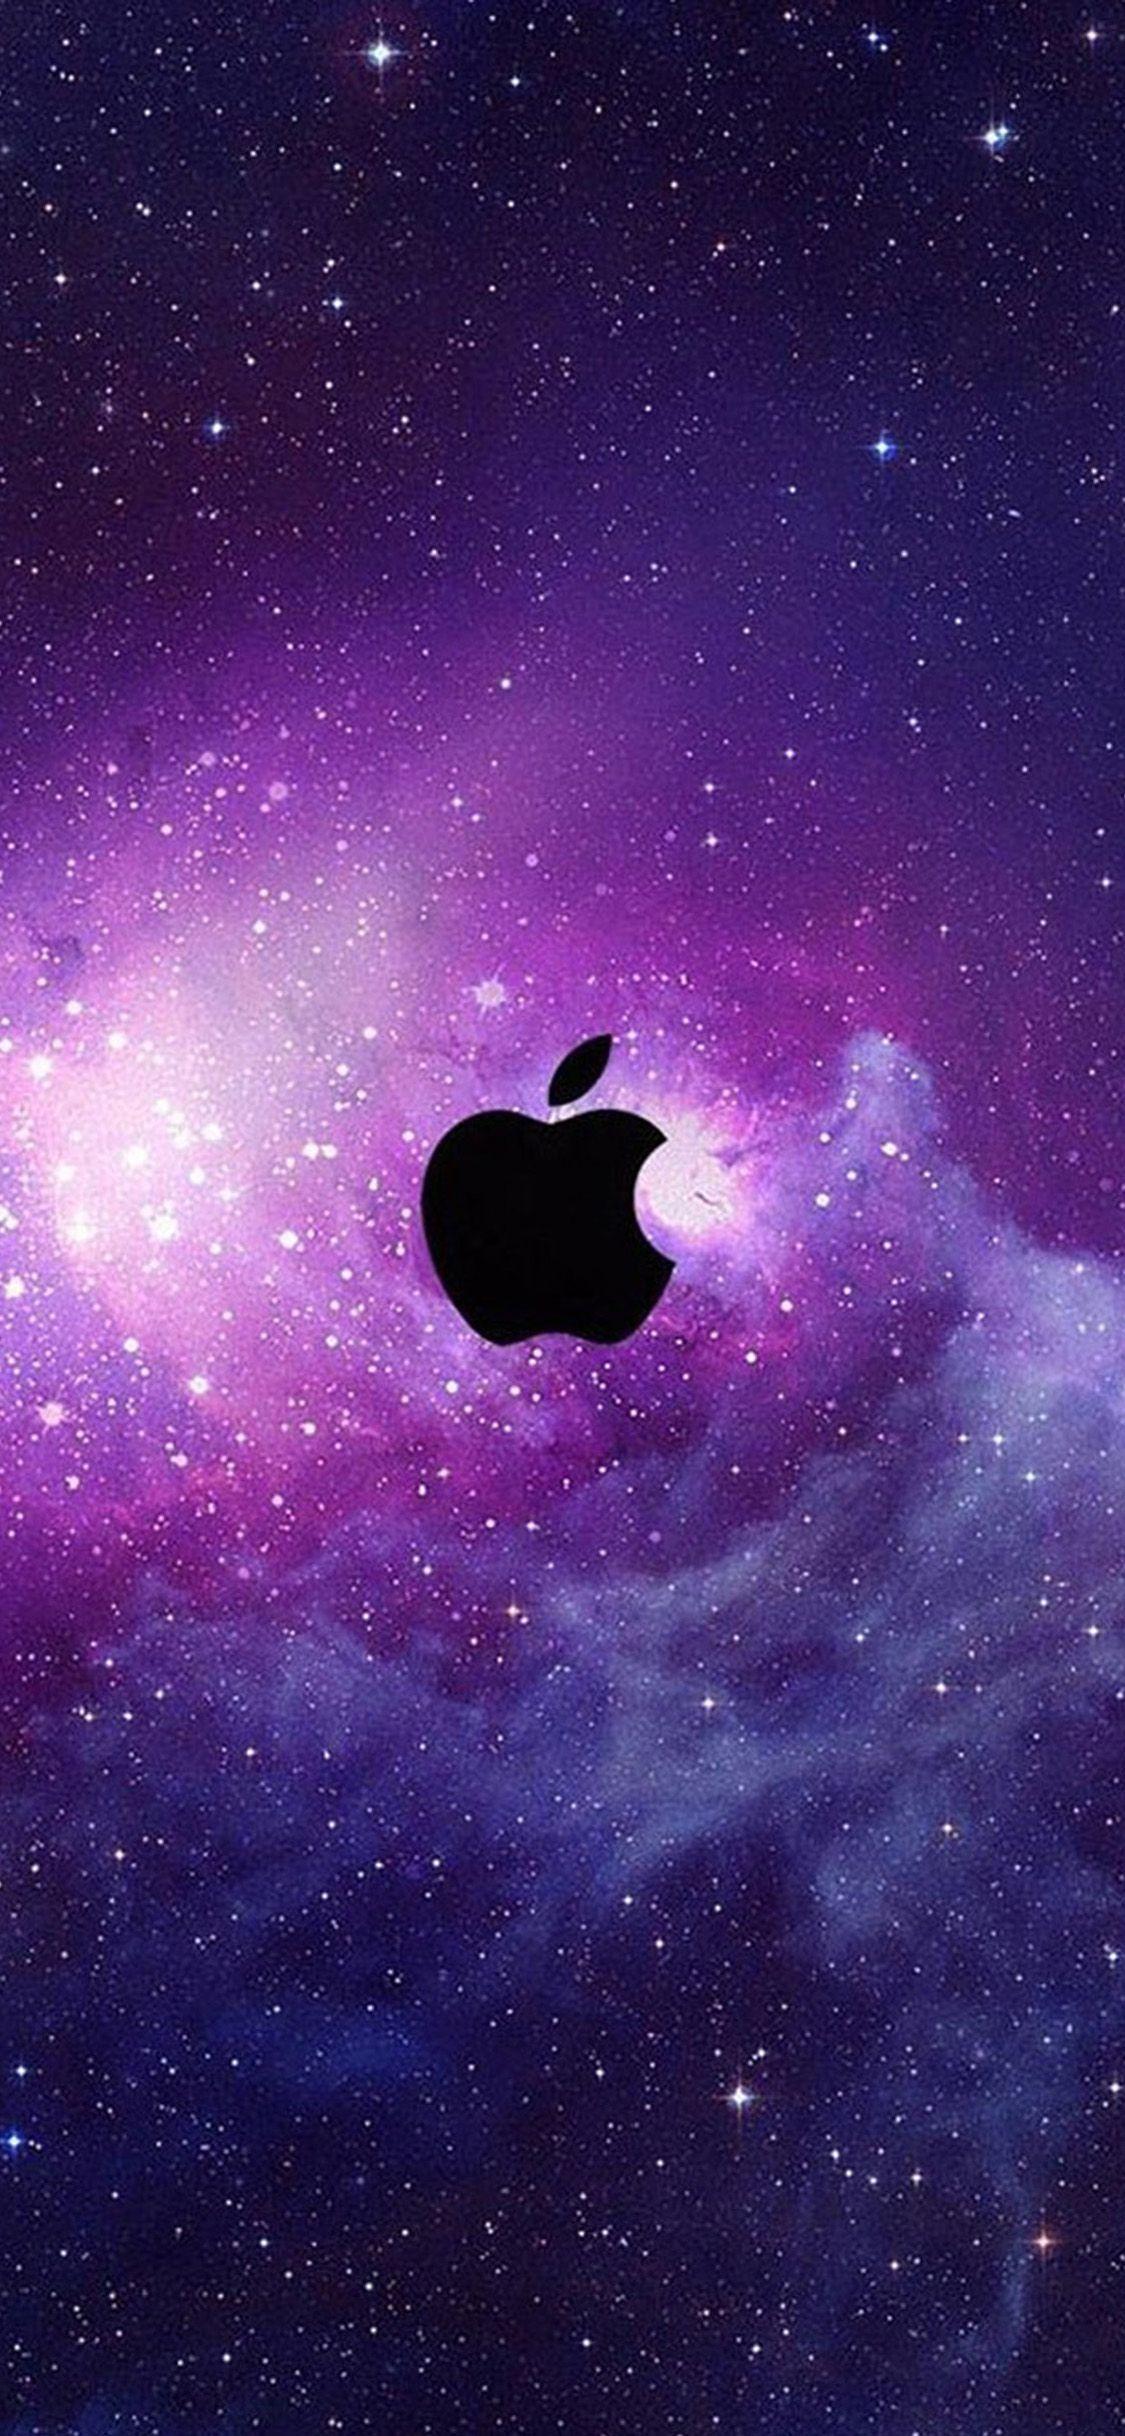 خلفيات ايفون Iphone X Wallpapers 2019 Tecnologis Apple Wallpaper Iphone Apple Logo Wallpaper Iphone Space Iphone Wallpaper